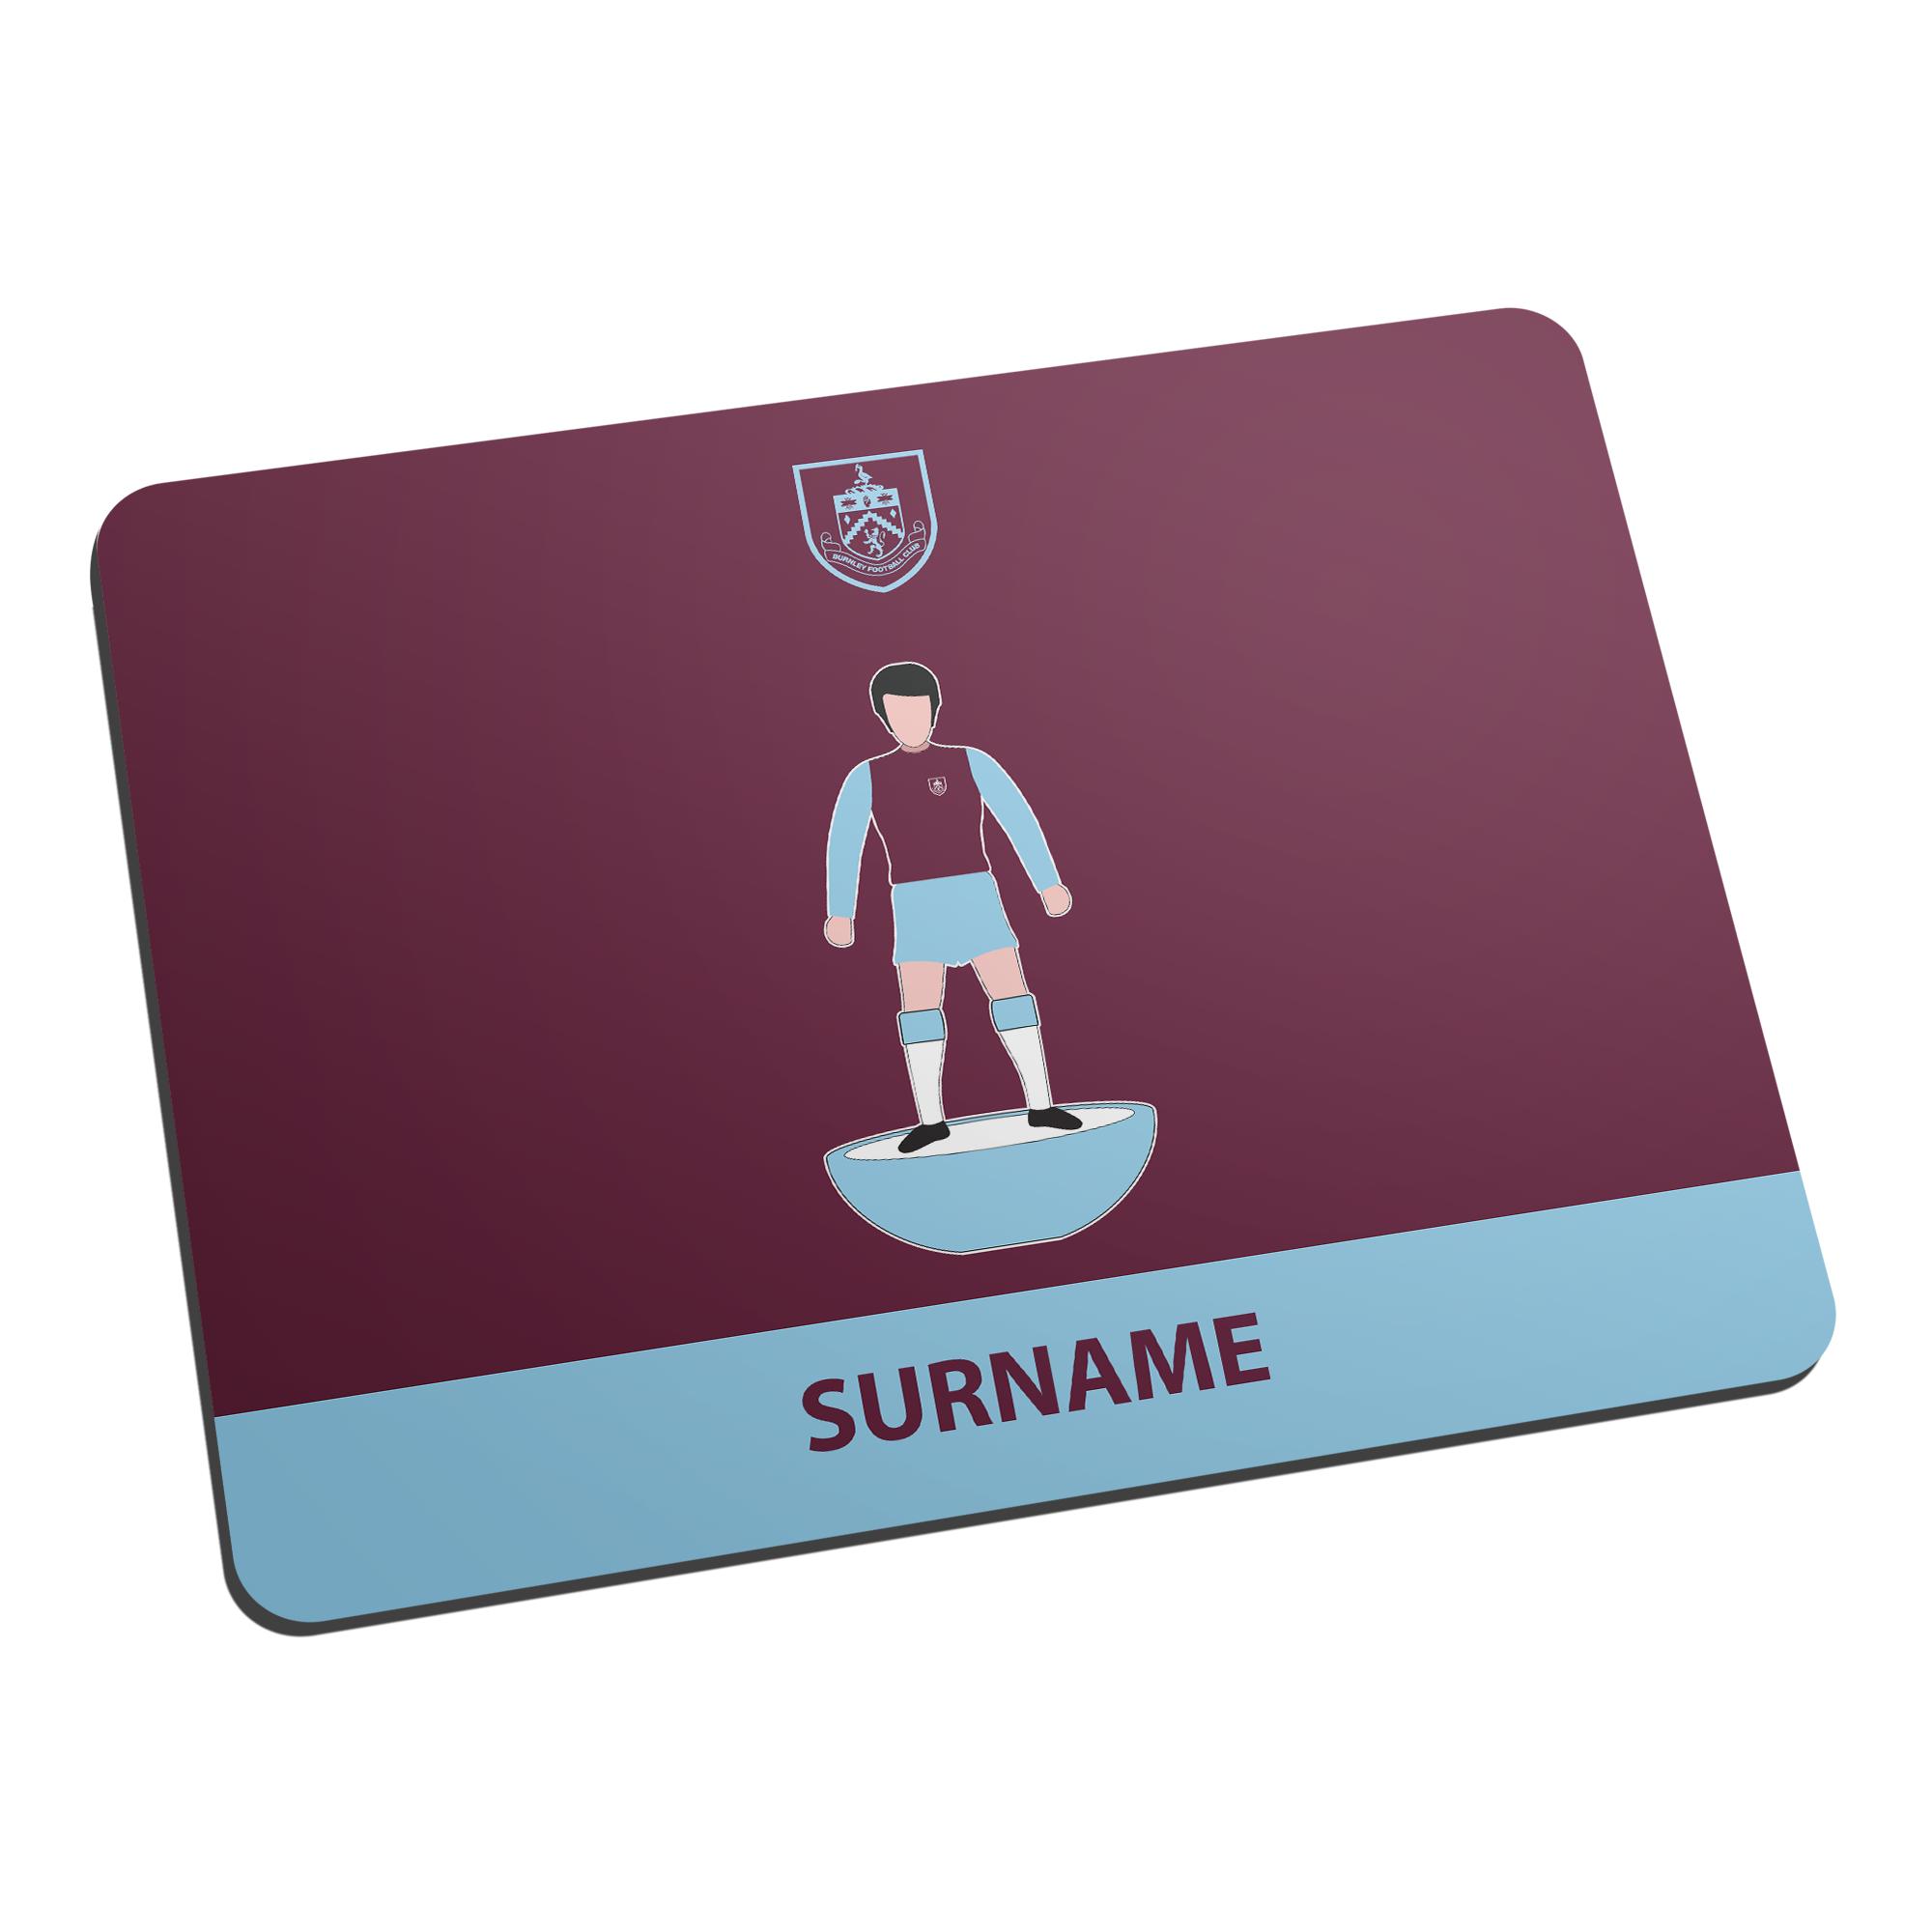 Burnley FC Player Figure Mouse Mat